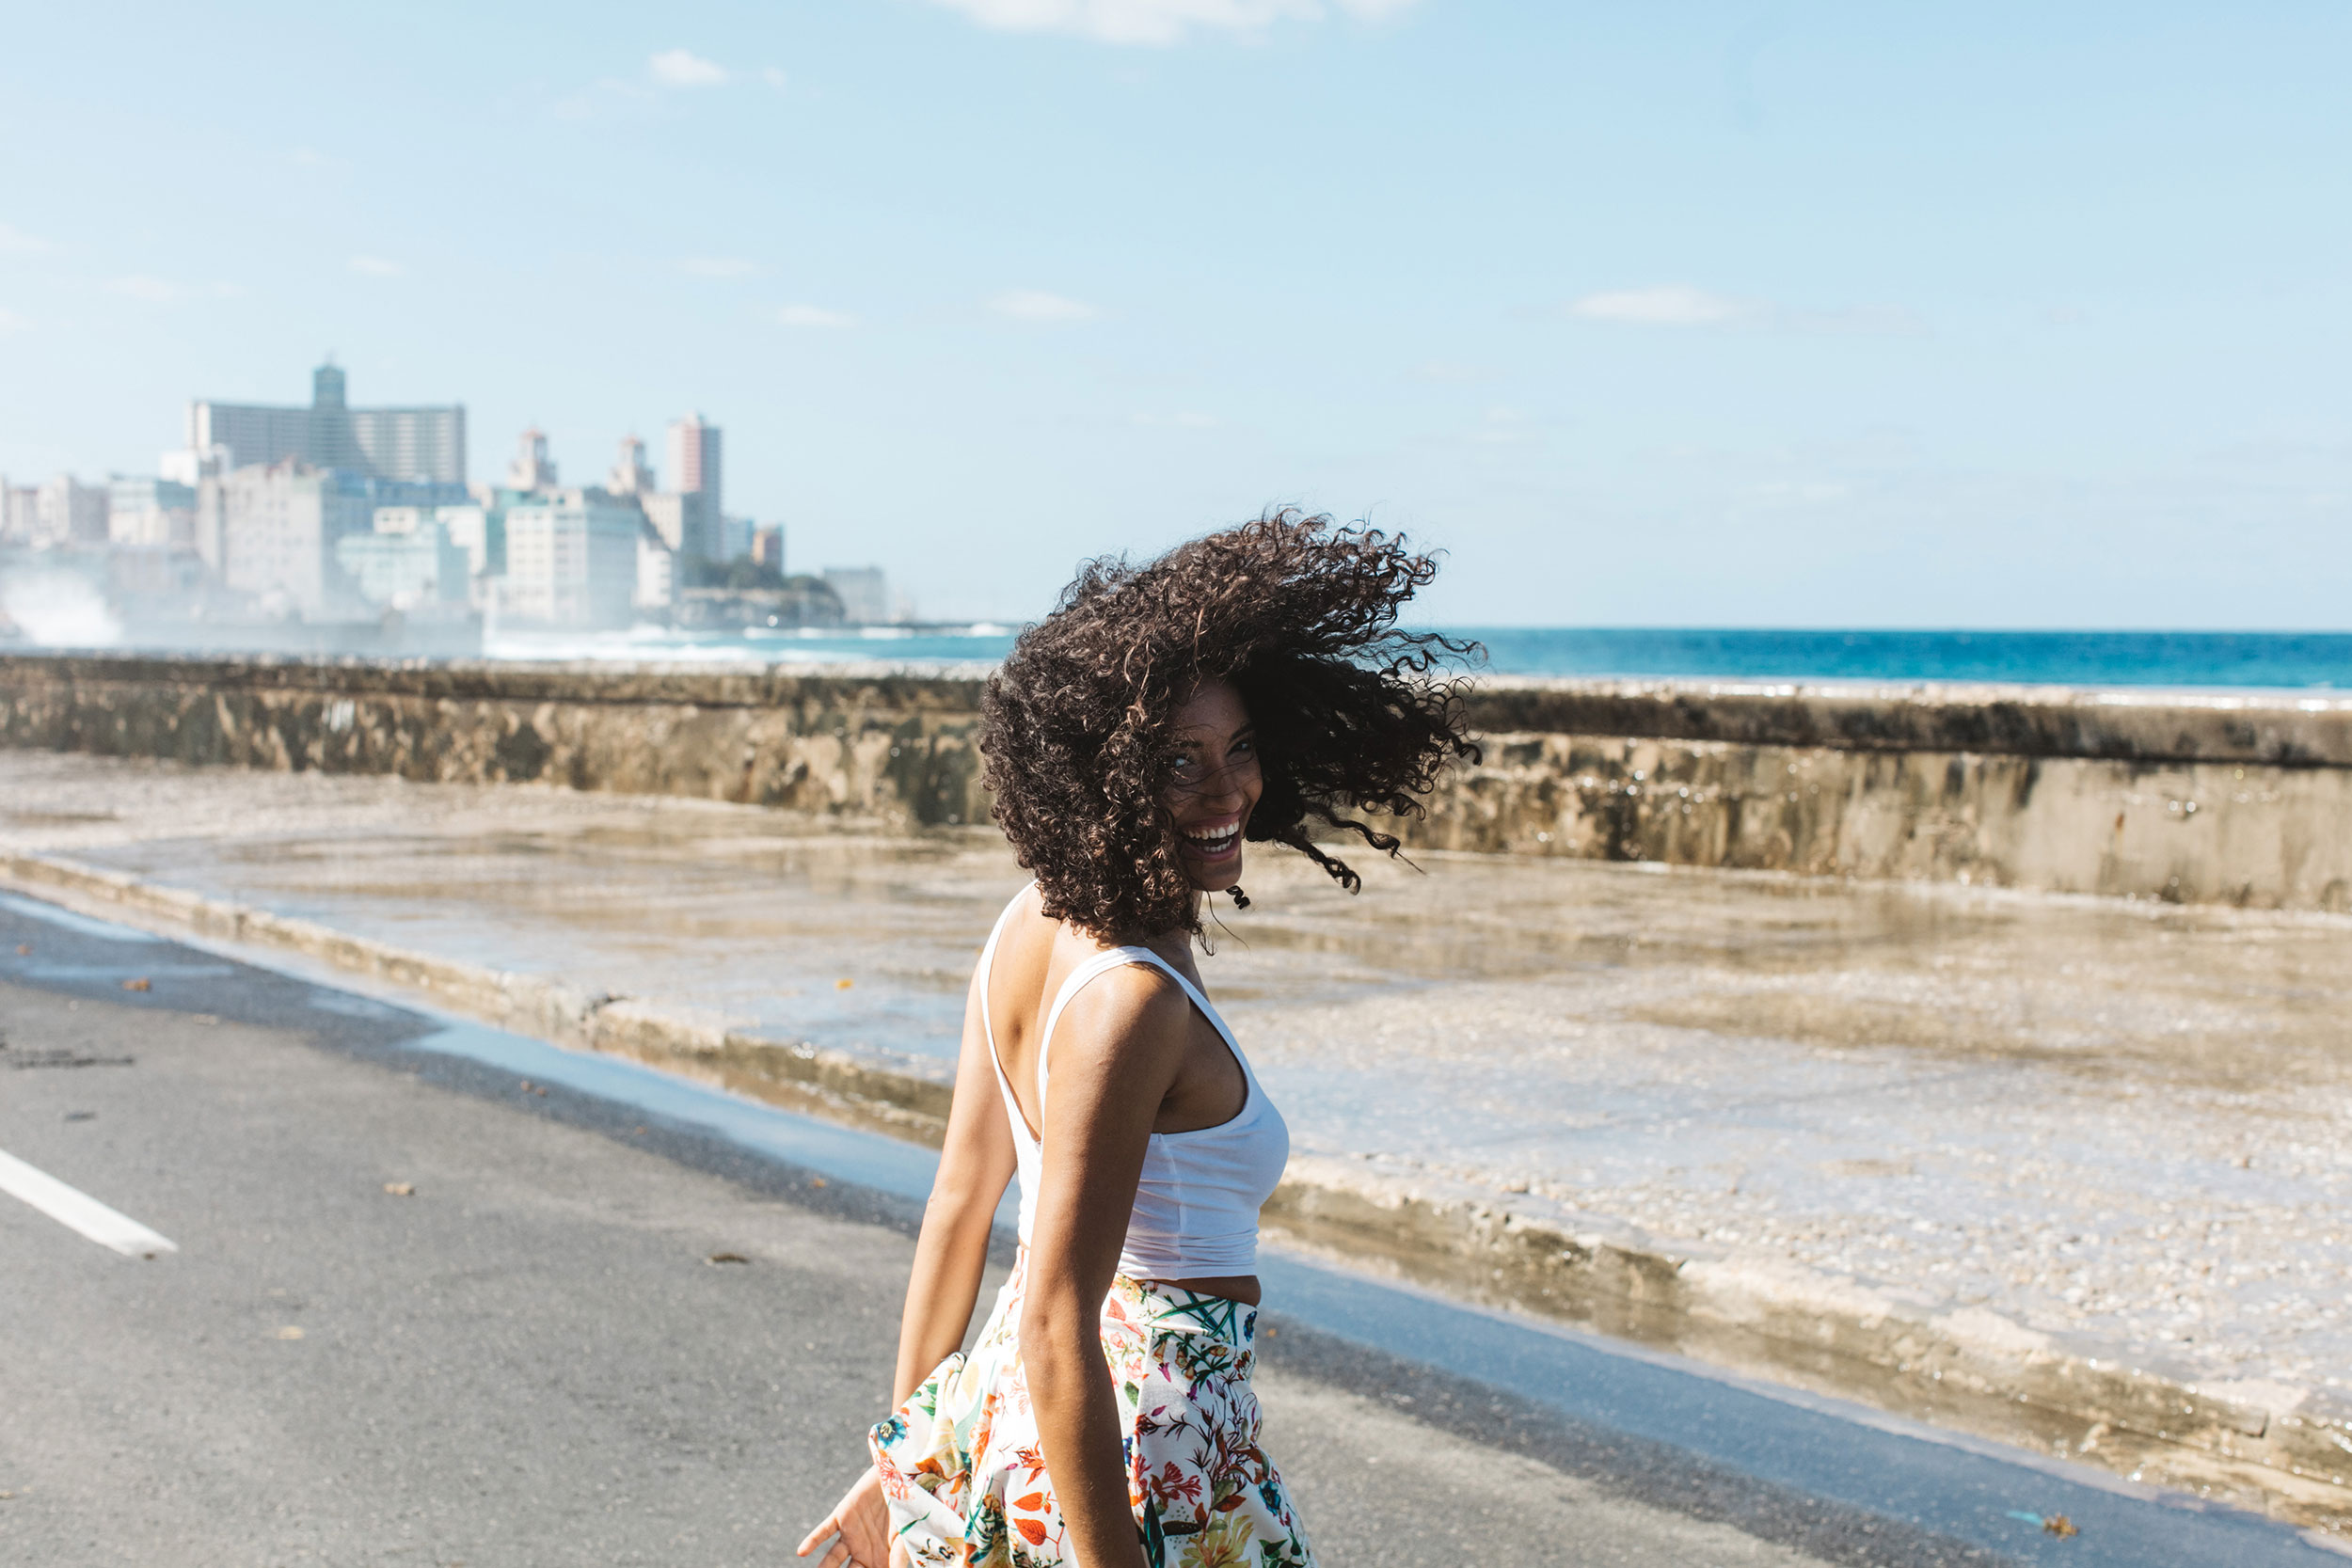 Cuba_MattPorteous_0011_1799.jpg